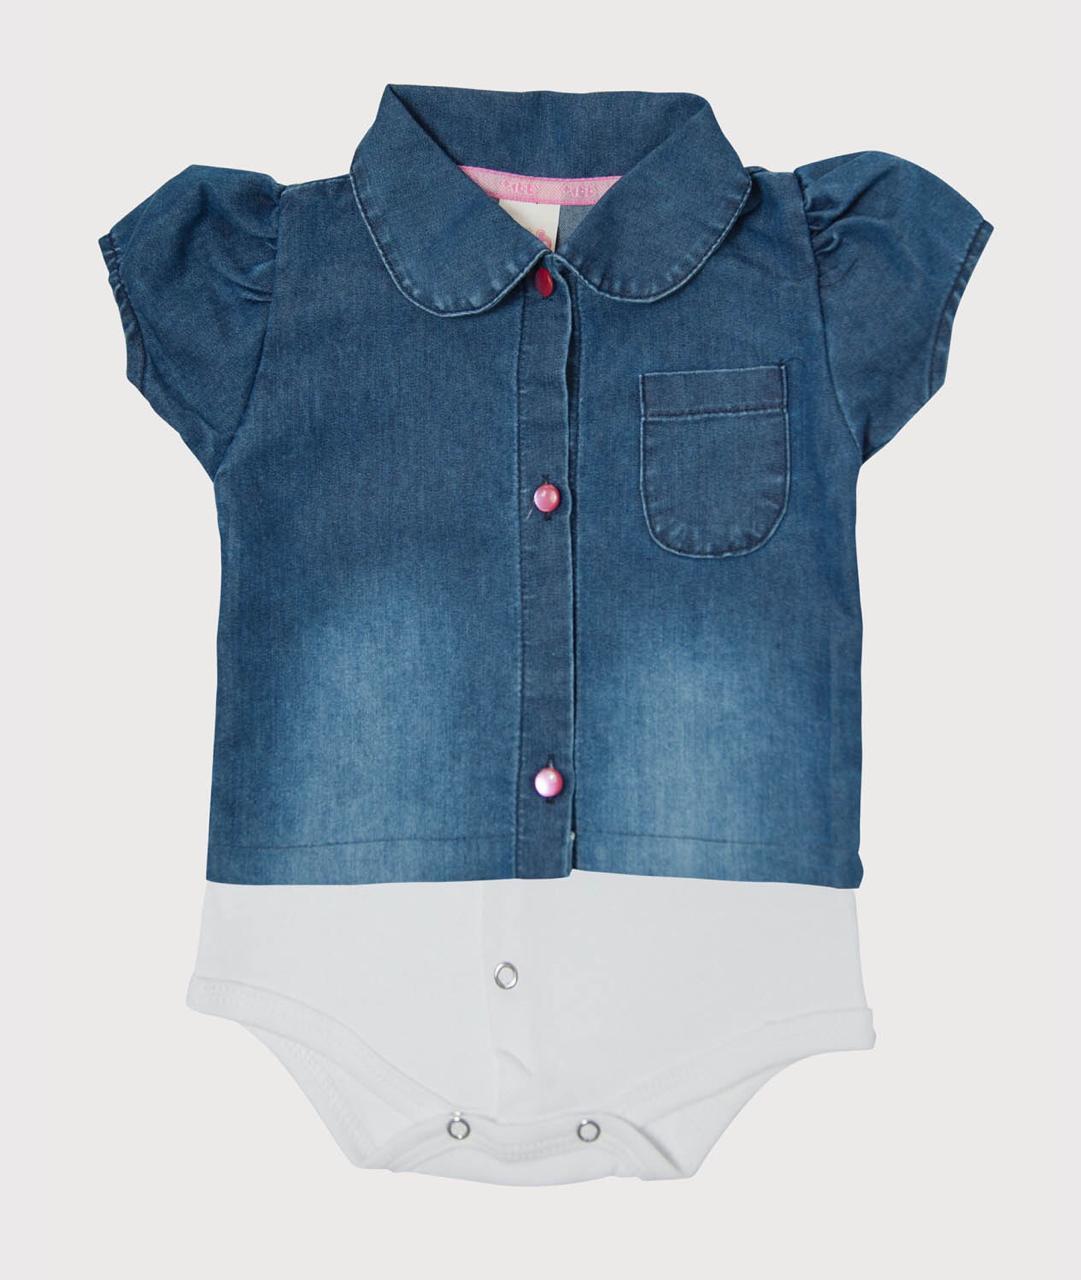 Body Camisa Jeans Manga Curta - Feminino